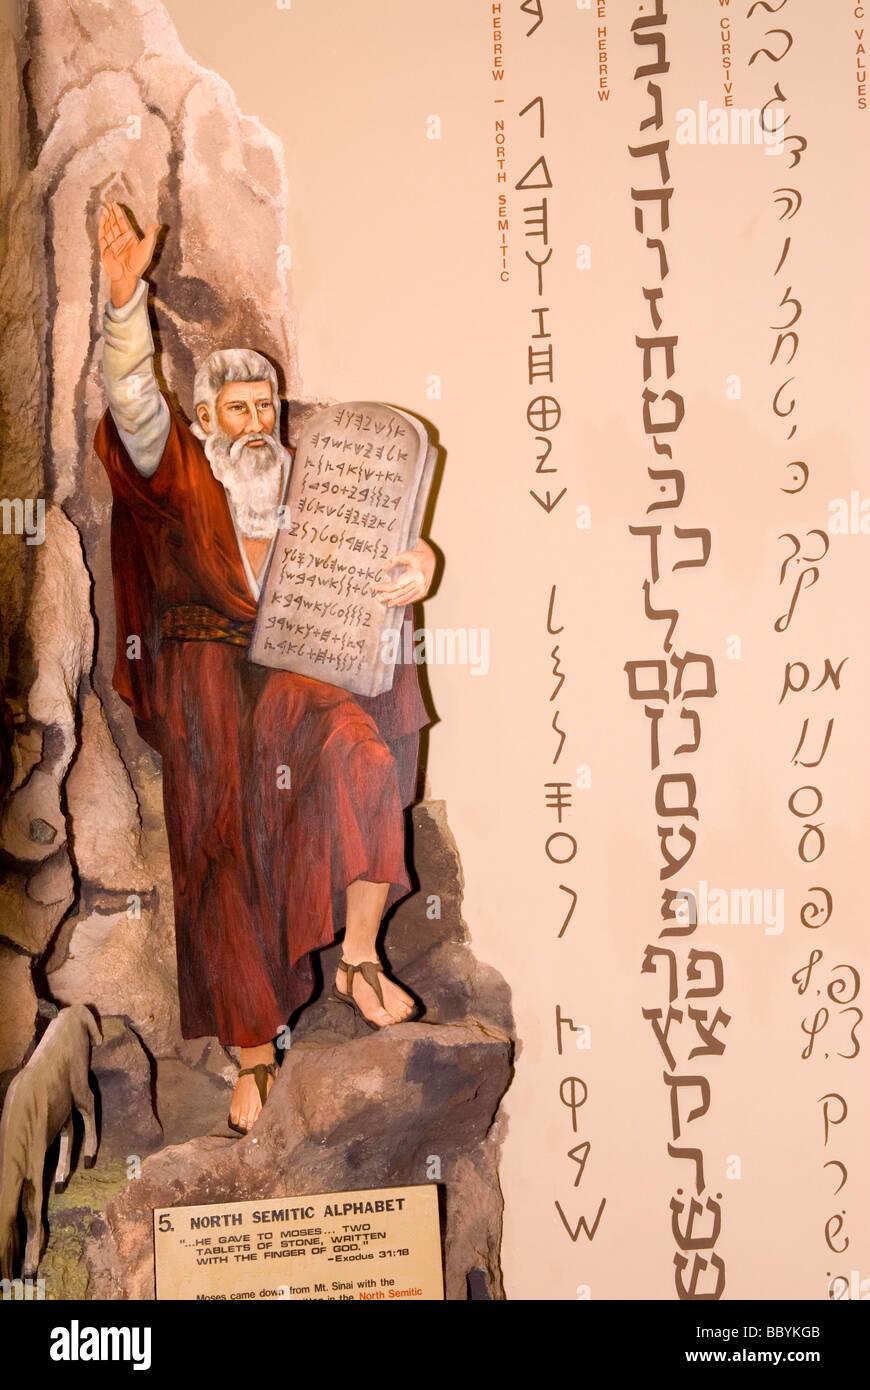 Museum of the Alphabet Waxhaw NC USA - Stock Image